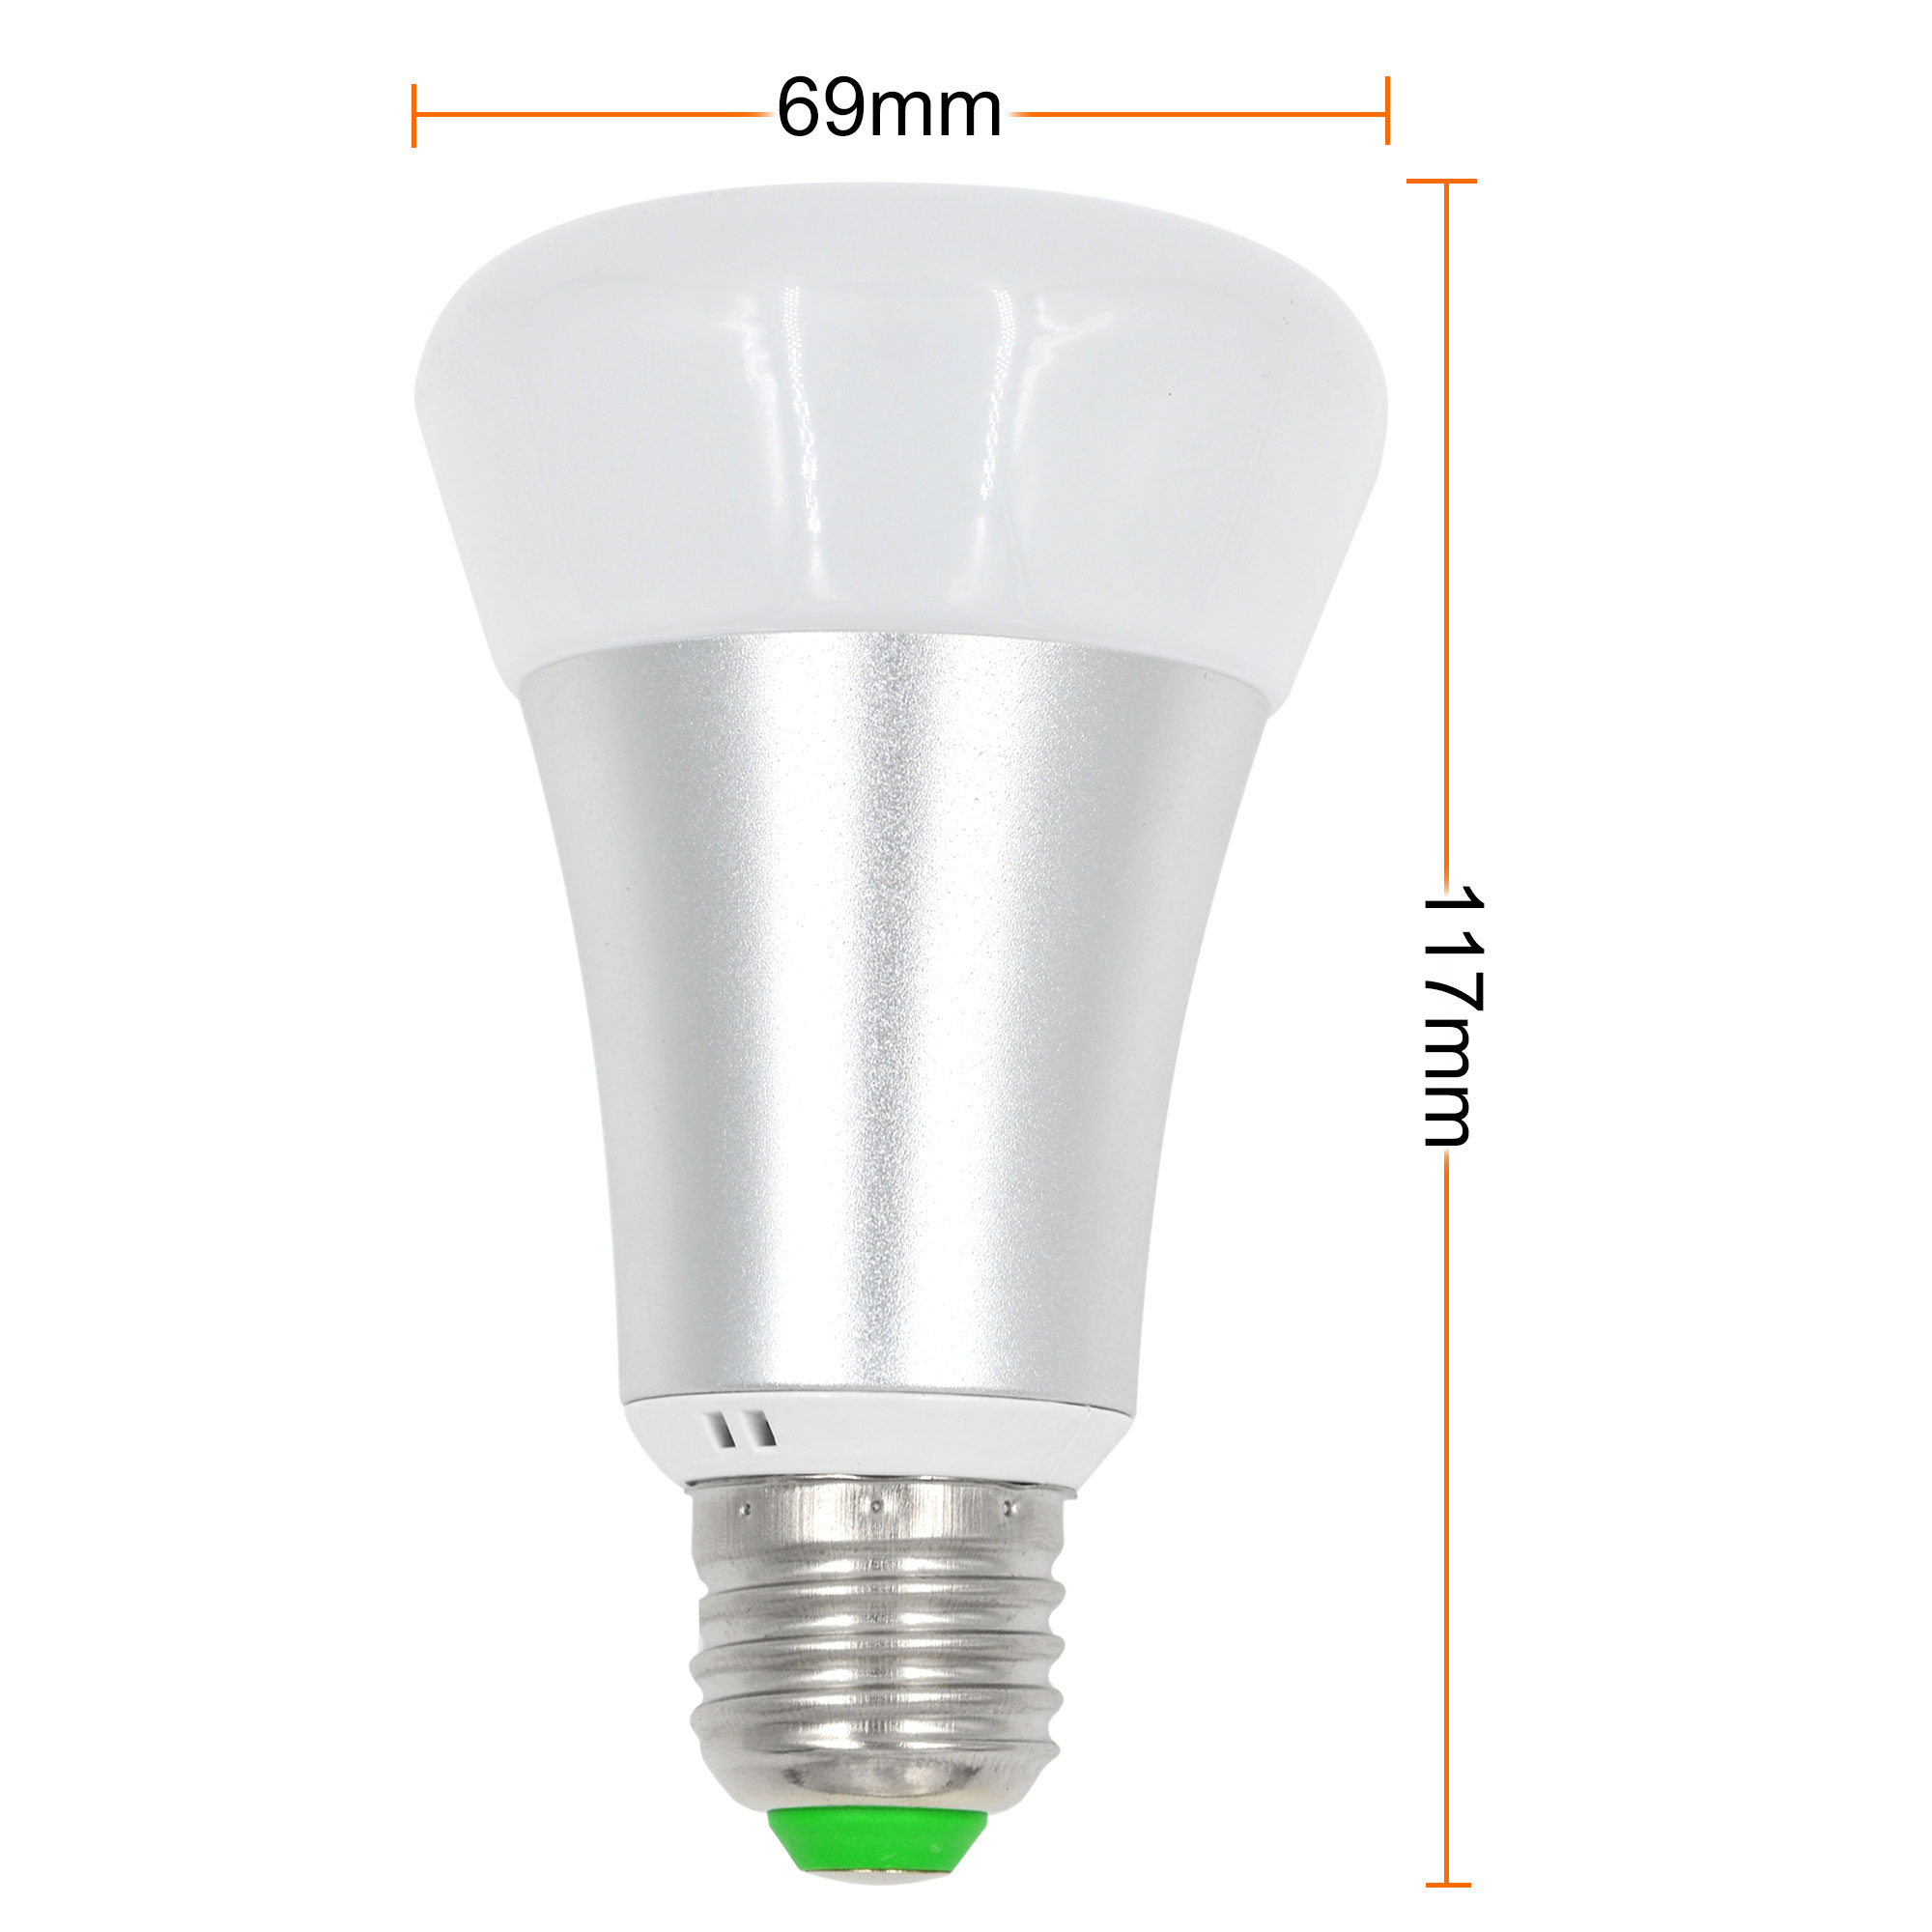 MengsLED – MENGS® E27 10W LED RGB+Cool White Globe Light 12